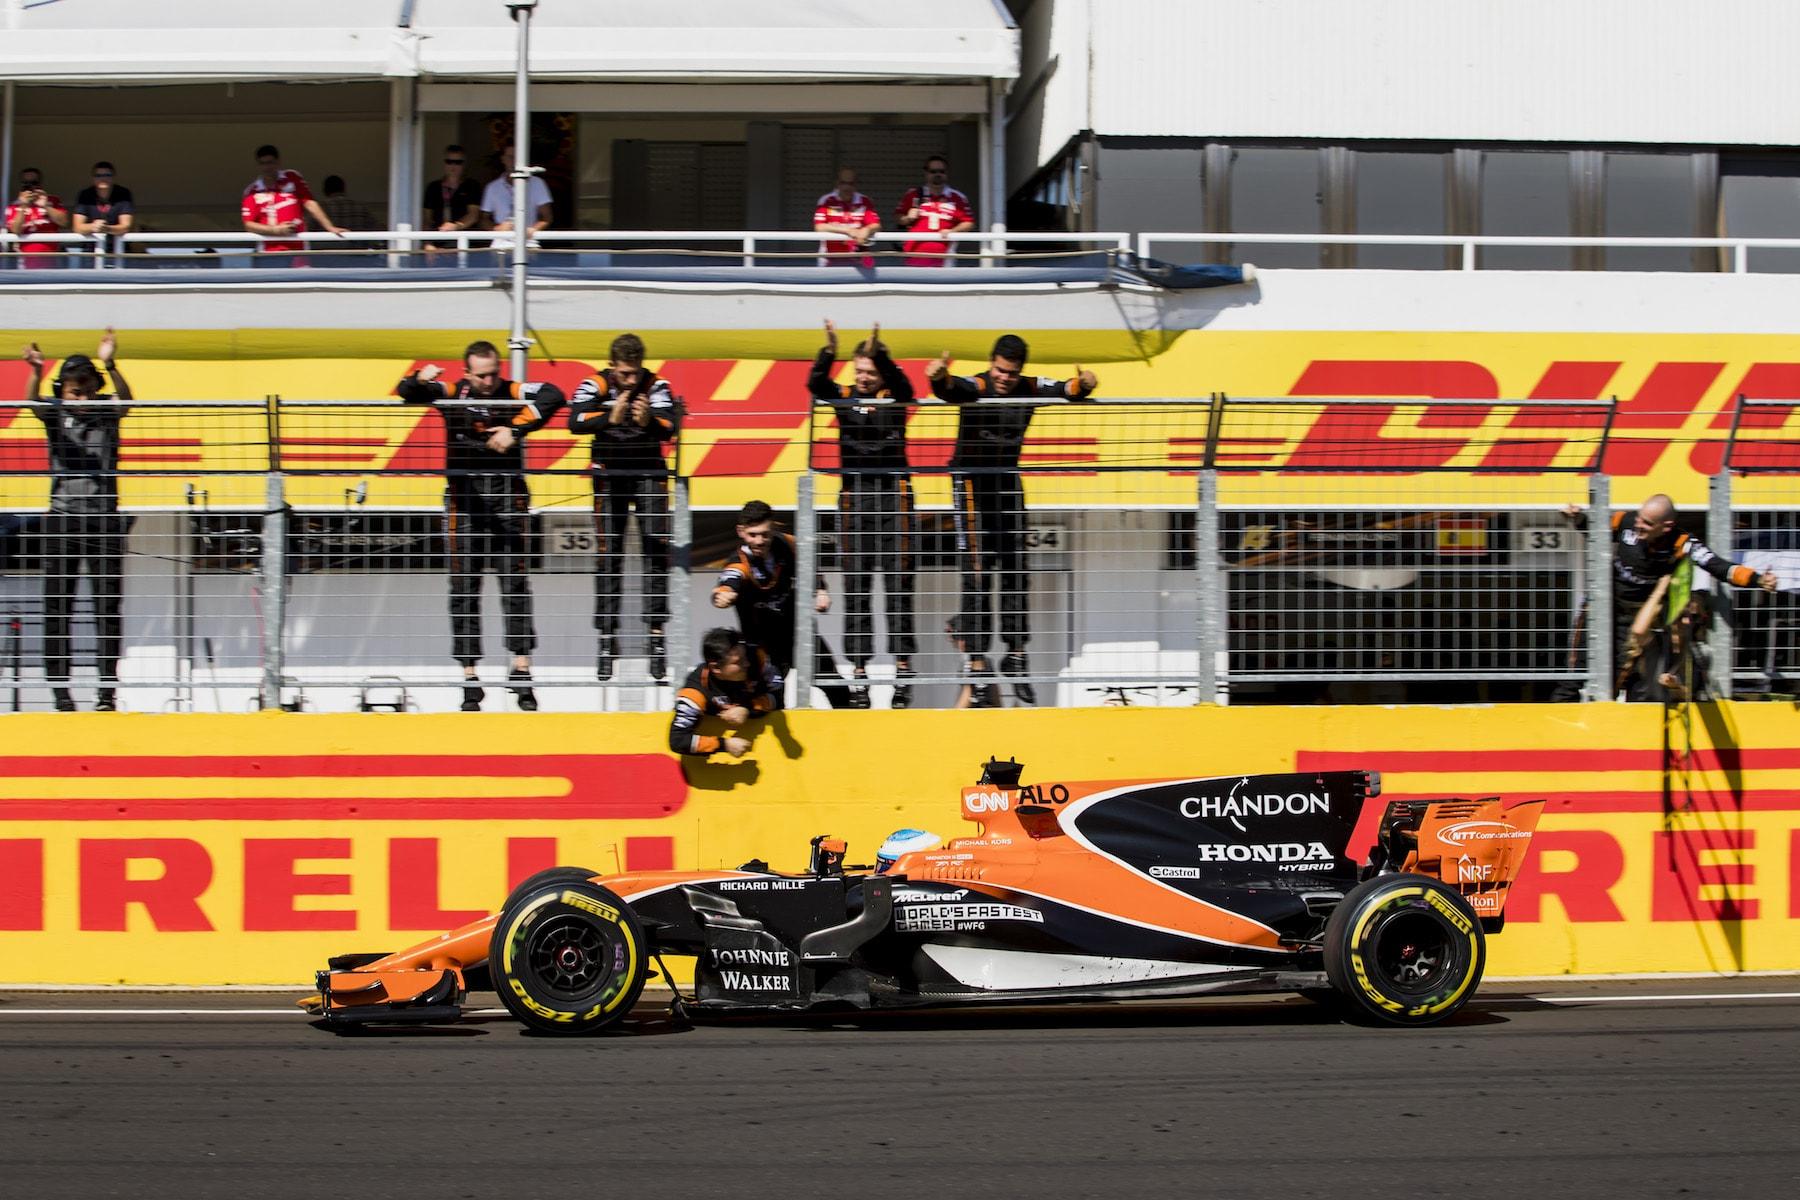 R 2017 Fernando Alonso | McLaren MCL32 | 2017 Hungarian GP P6 4 fastest lap copy.jpg